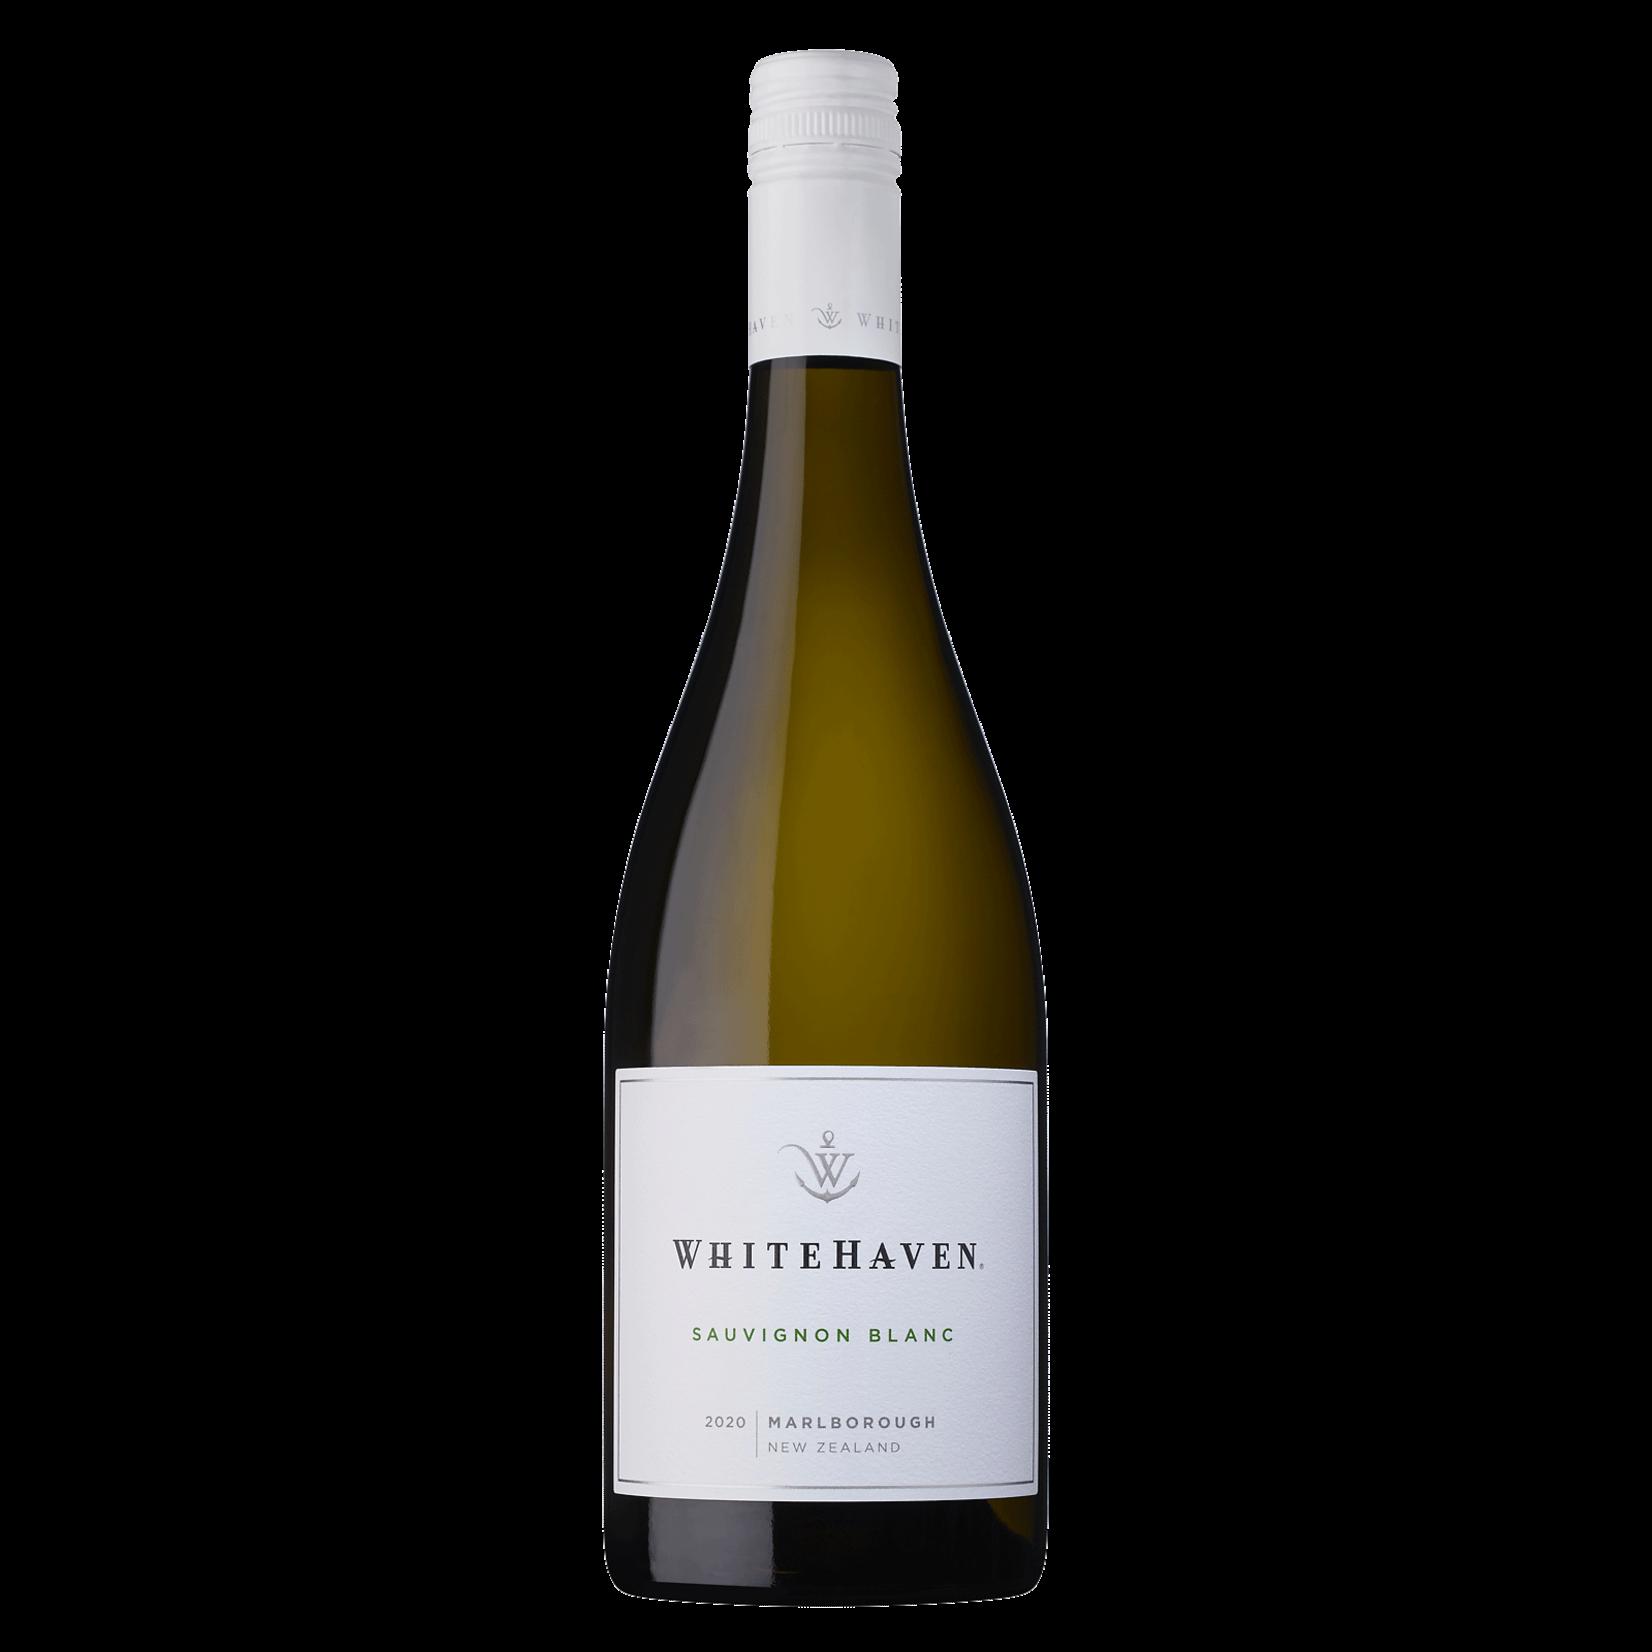 Wine Whitehaven Sauvignon Blanc 2020